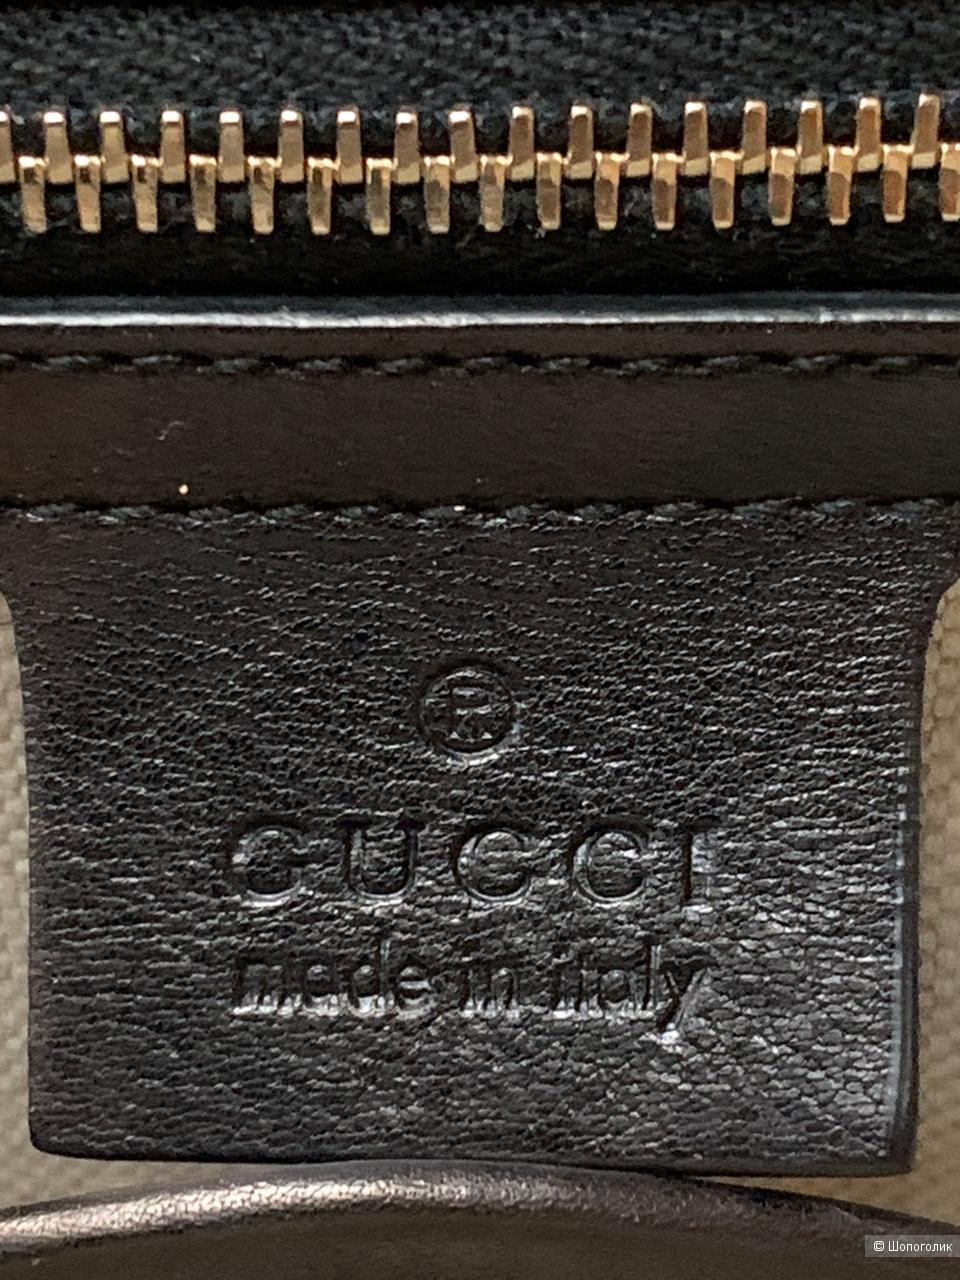 Сумка кроссбоди Gucci New Bamboo Medium